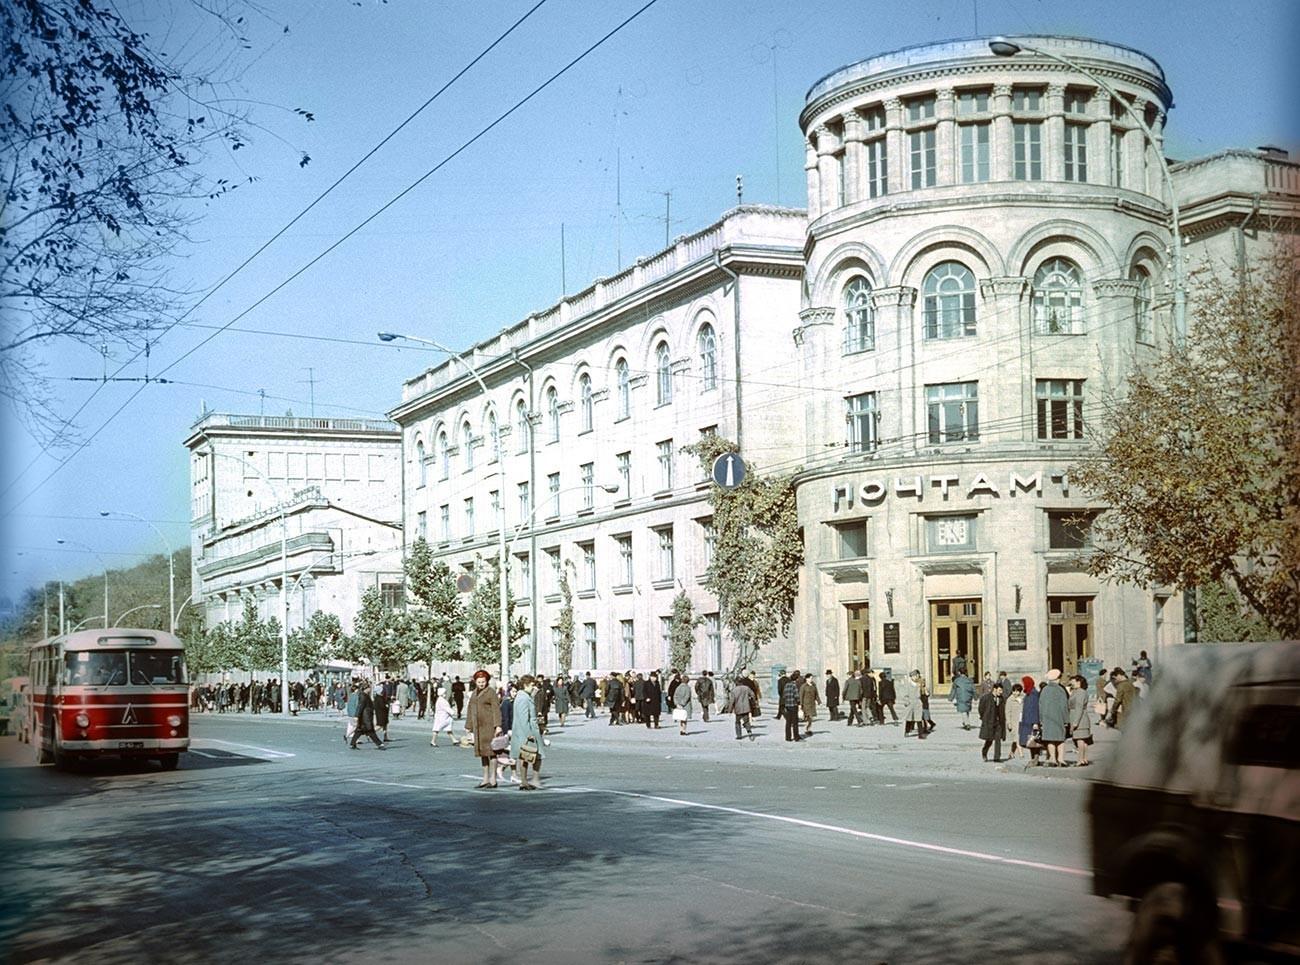 Zgradba Pošte v Kišinjevu, 1972